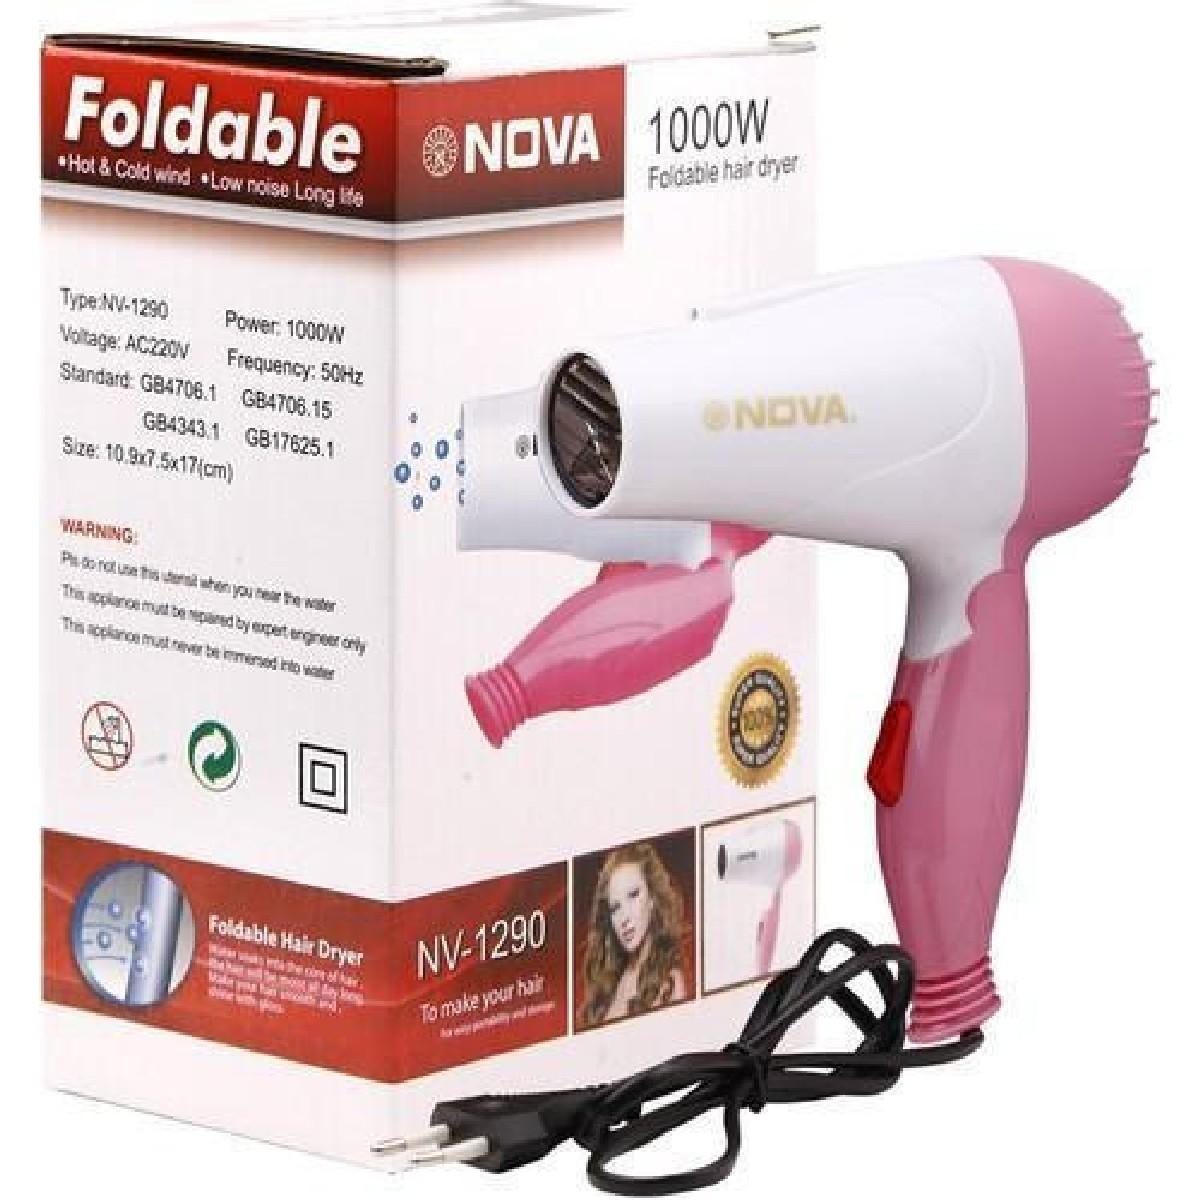 Original Portable Heavy Duty Electrical Foldable Nova Mini hair dryer 1000 Watt For Kids or Boys or Girls & Men or Women